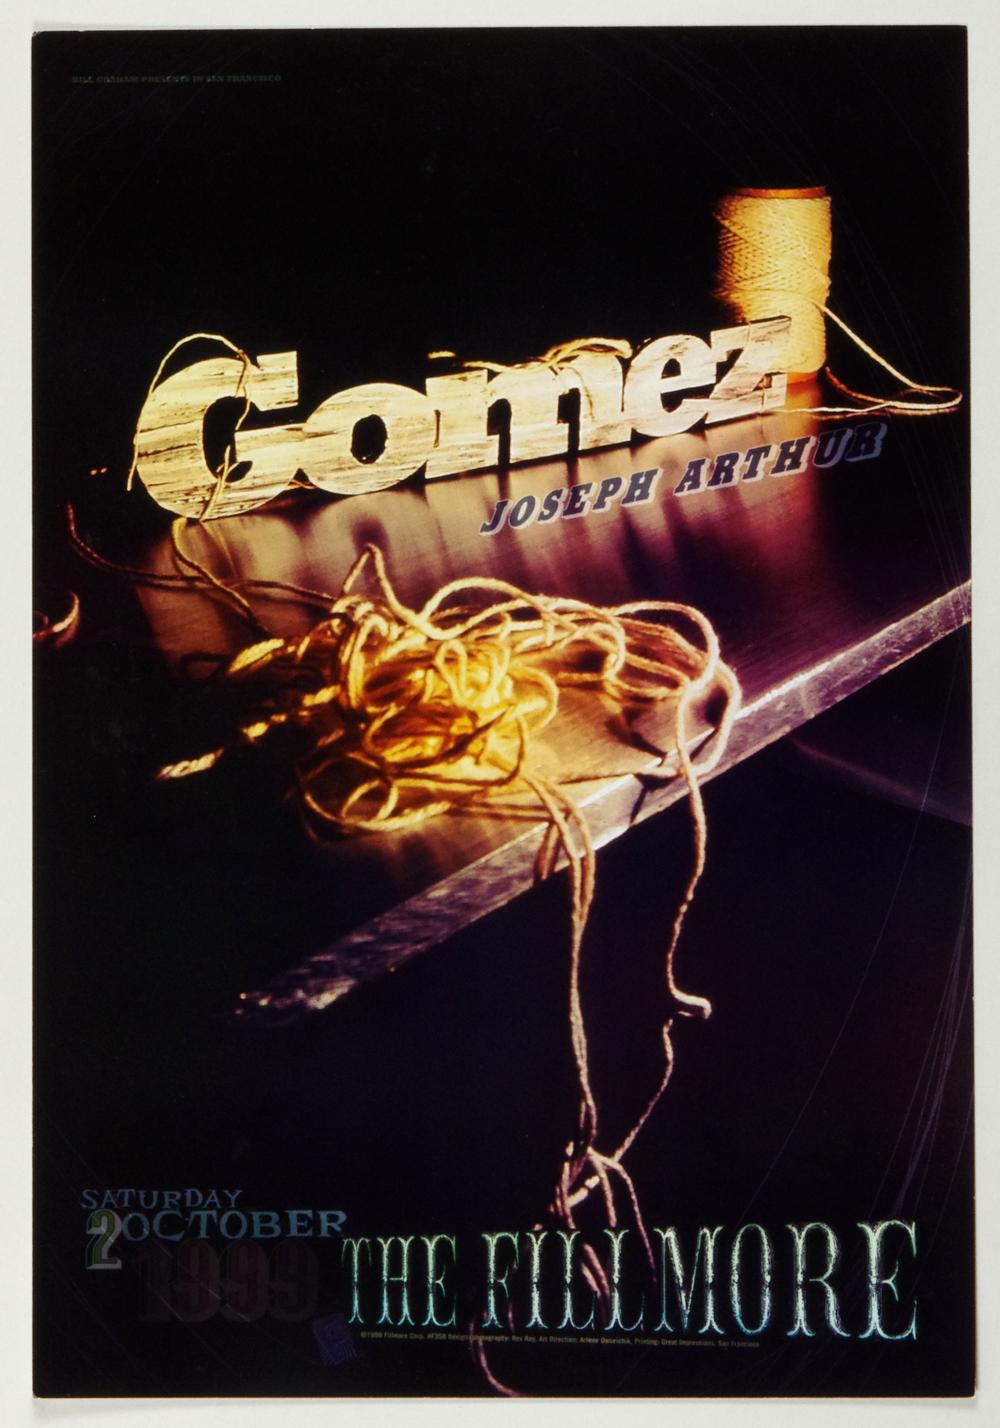 New Fillmore F358 Poster Gomez Joseph Arthur 1999 Oct 2